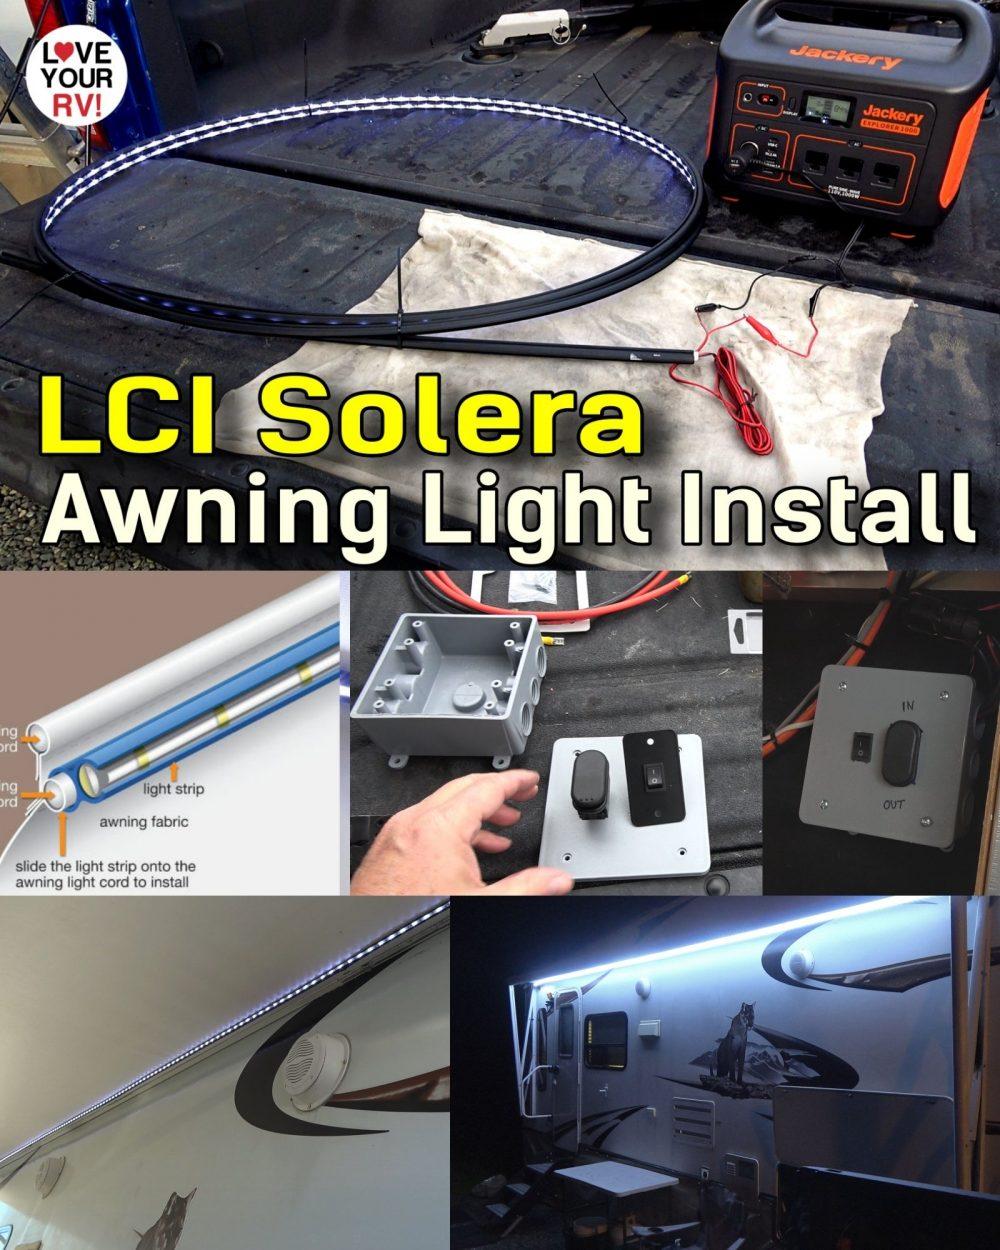 LCI Solera Awning Light Install plus Extra Power Switch Mod